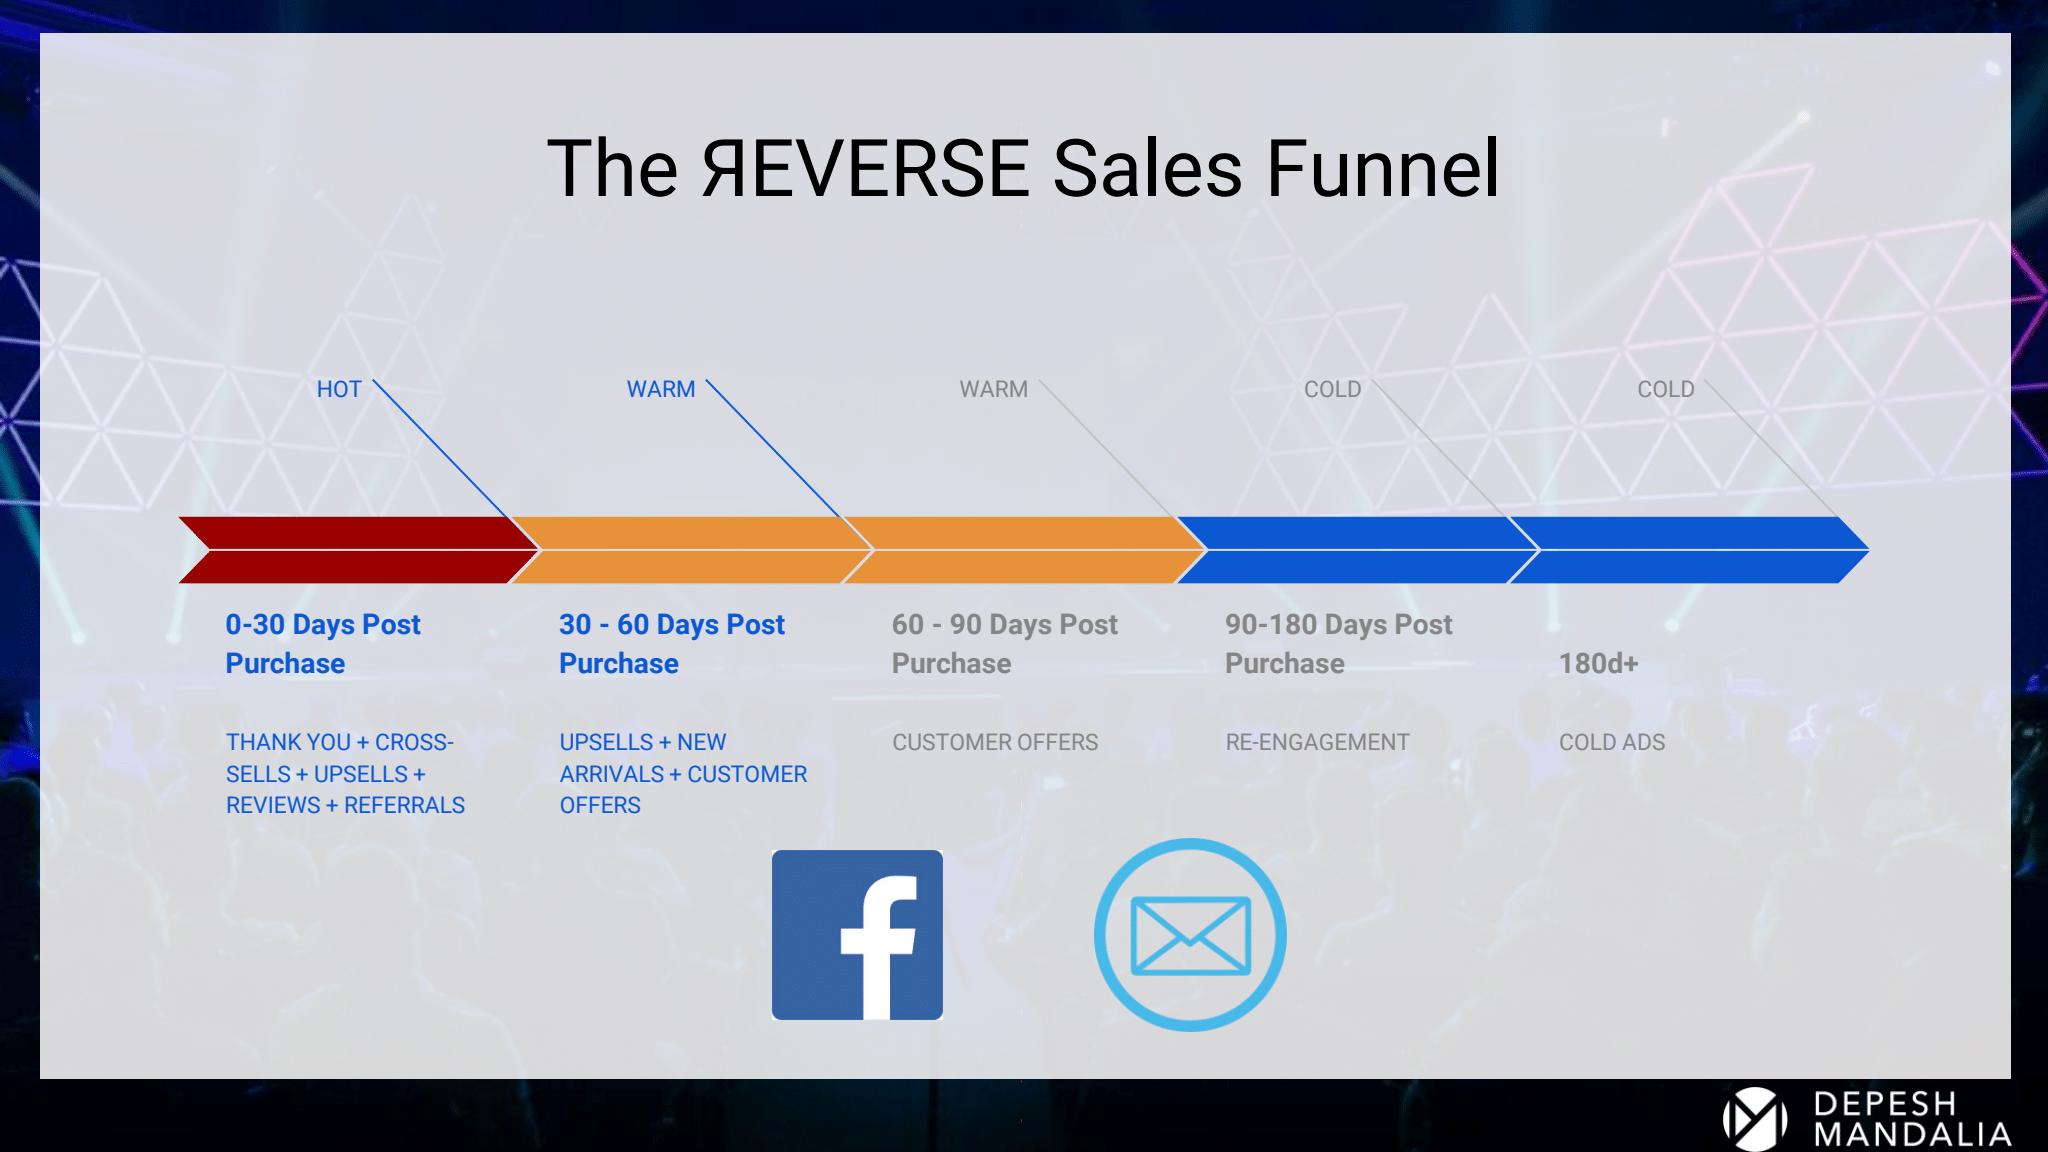 Depesh Mandalia – The Reverse Sales Funnel